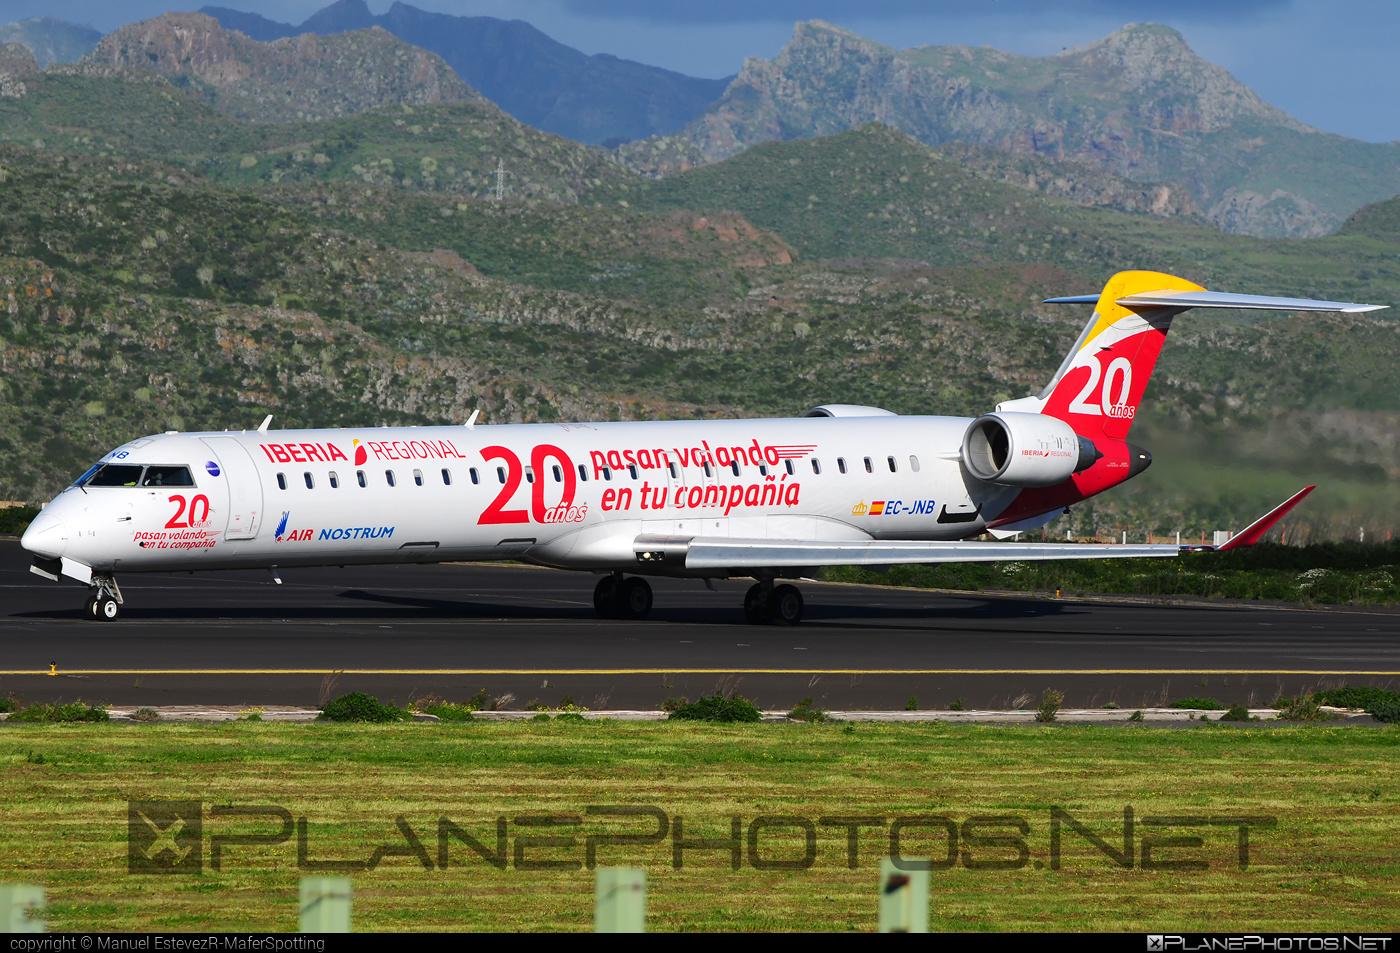 Bombardier CRJ900LR - EC-JNB operated by Iberia Regional (Air Nostrum) #airnostrum #bombardier #crj900 #crj900lr #iberia #iberiaregional